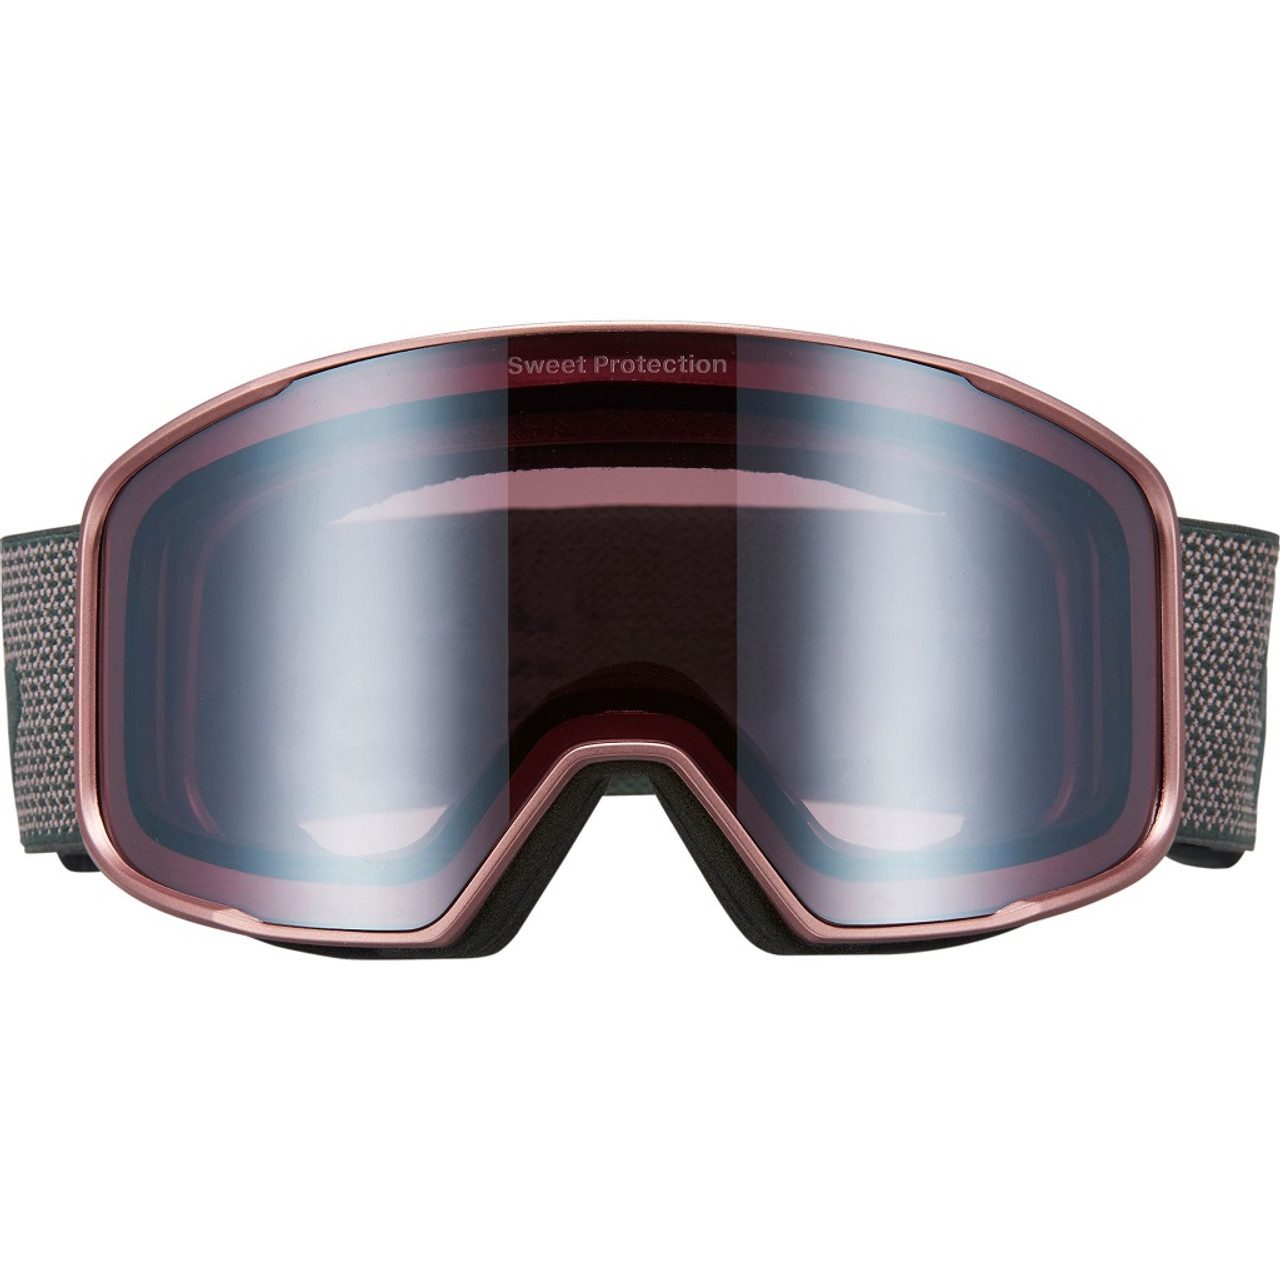 RIG Reflect Malaia - Sweet Protection Boondock Lenses